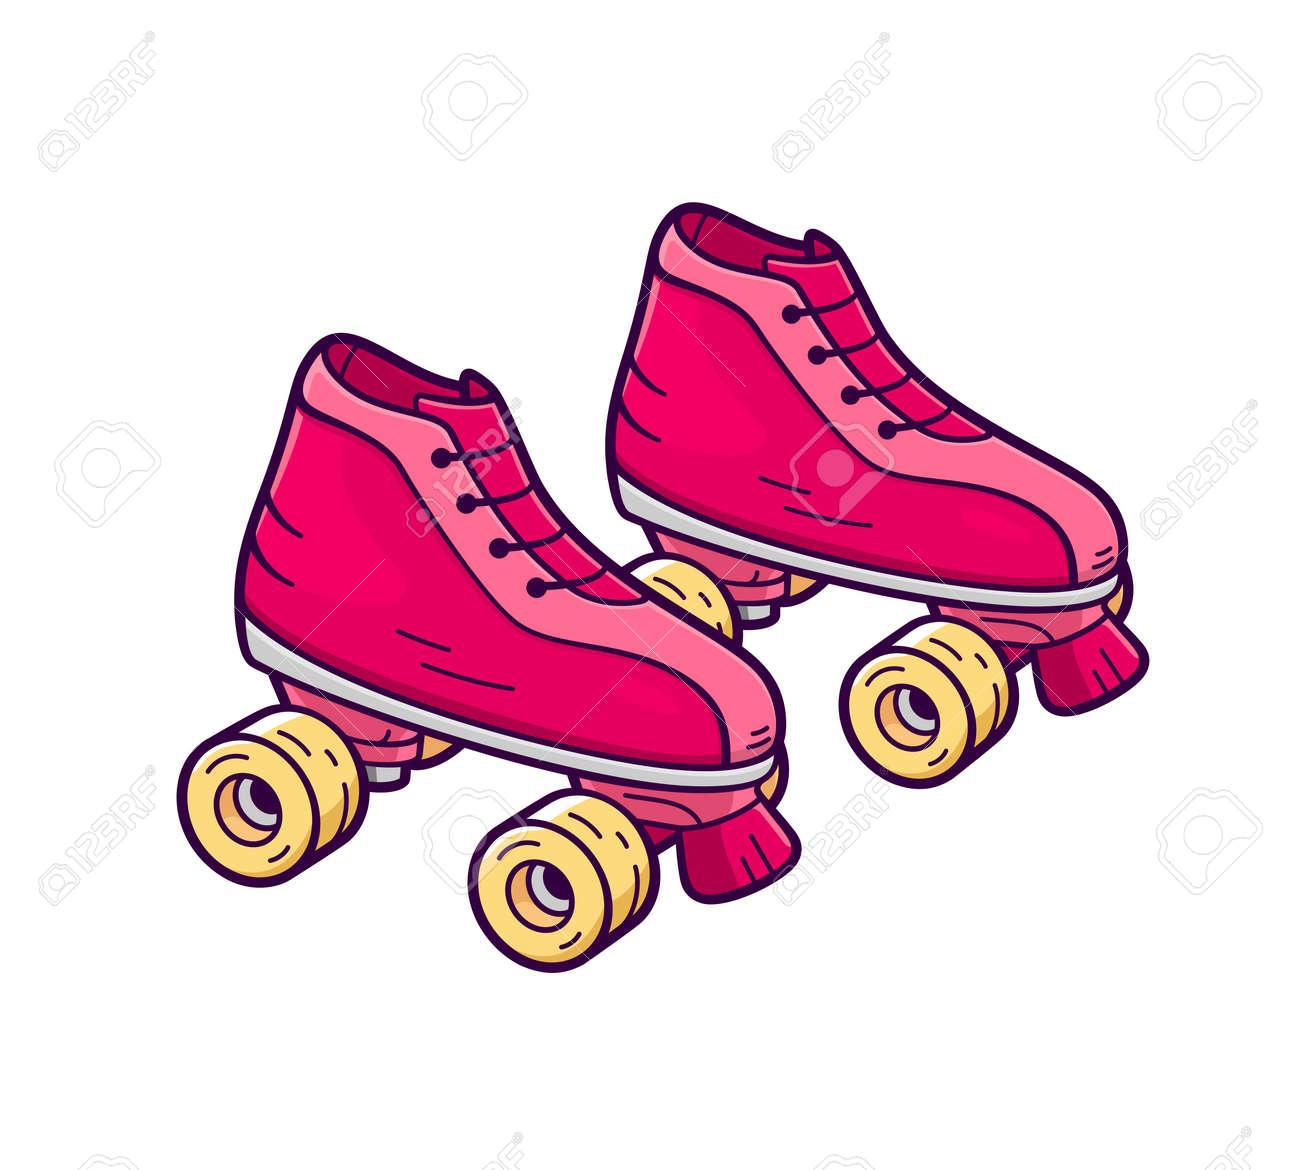 retro quad roller skates royalty free cliparts vectors and stock rh 123rf com roller skating clipart free roller skating cartoon characters